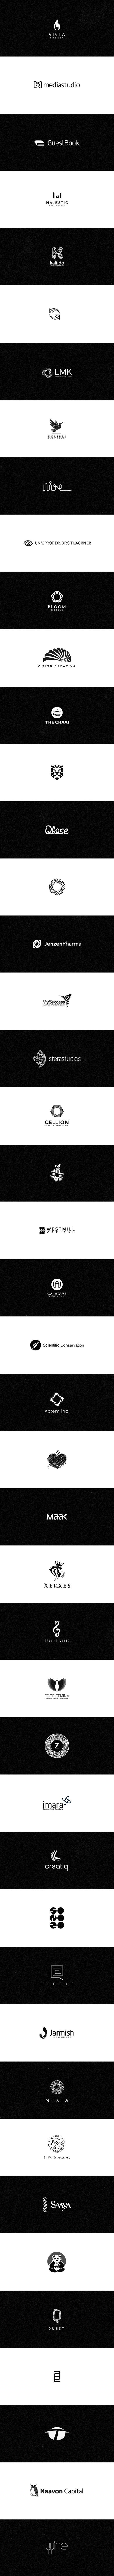 Logos 2010-2012 by almosh82 , via Behance